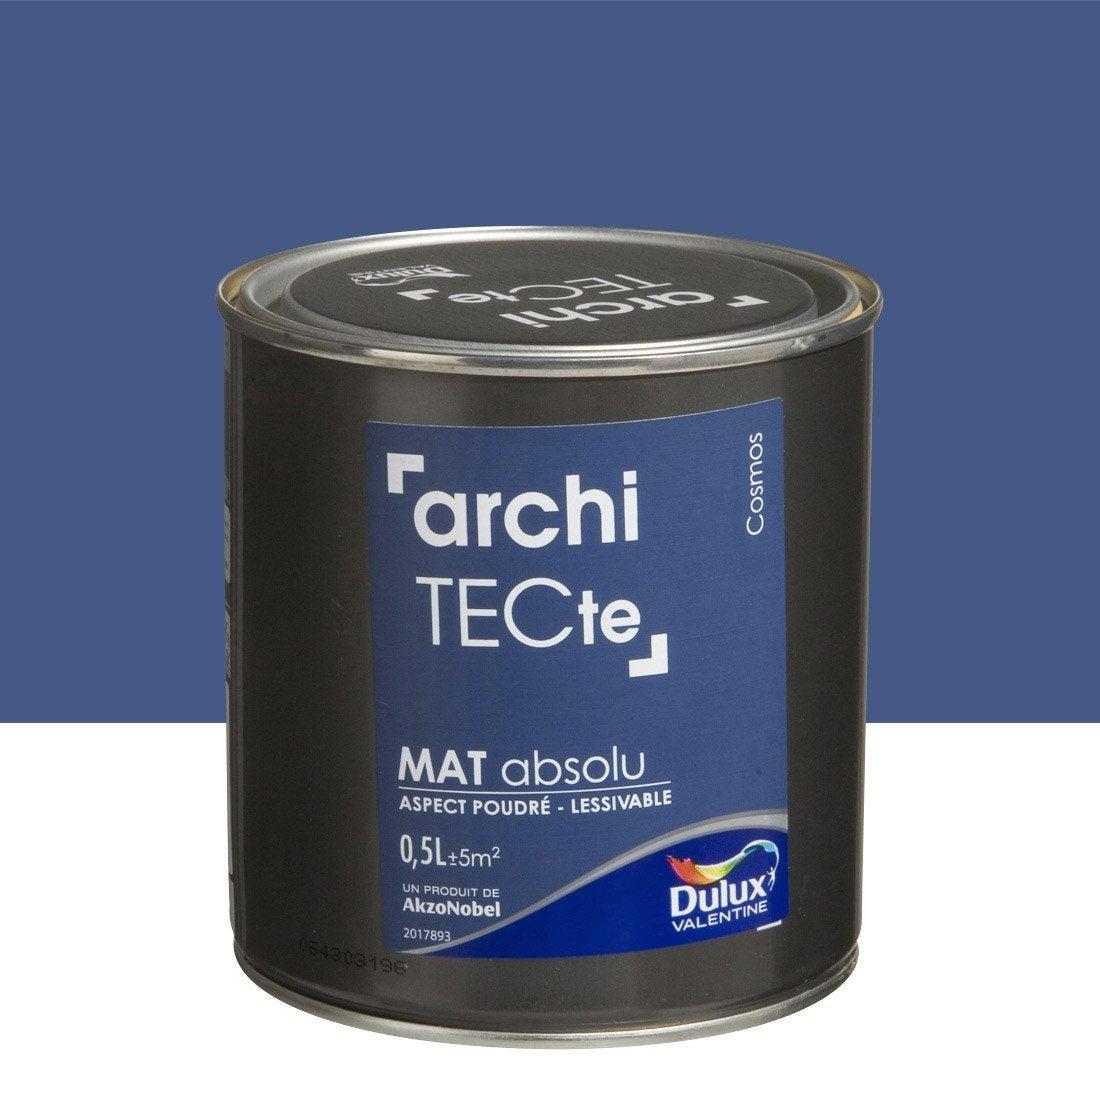 peinture multisupports architecte dulux valentine bleu On peinture bleu marine leroy merlin